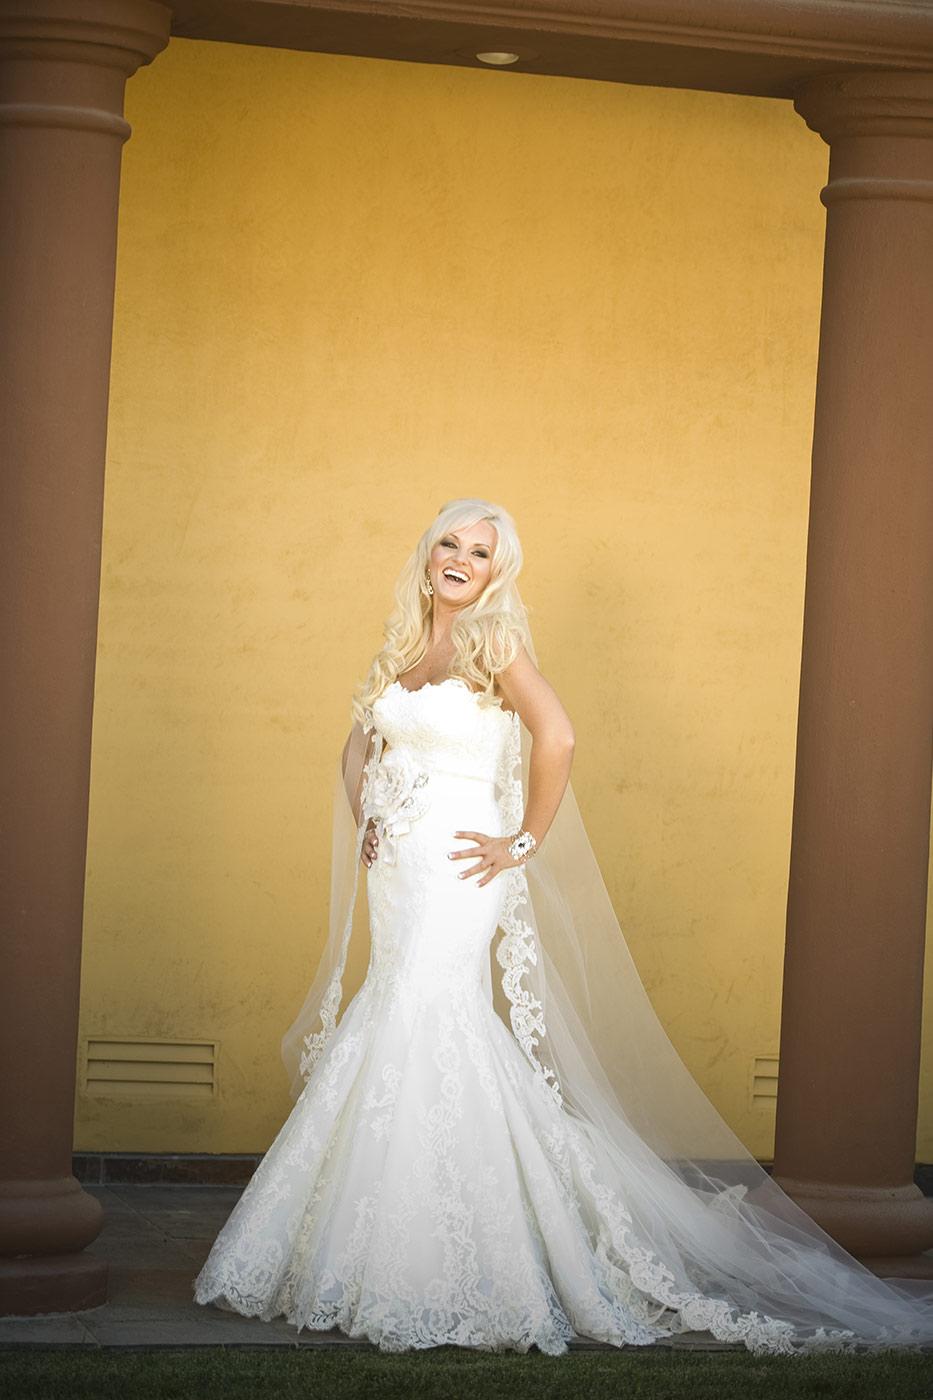 Ready, Set, Shine - A Real Wedding Story